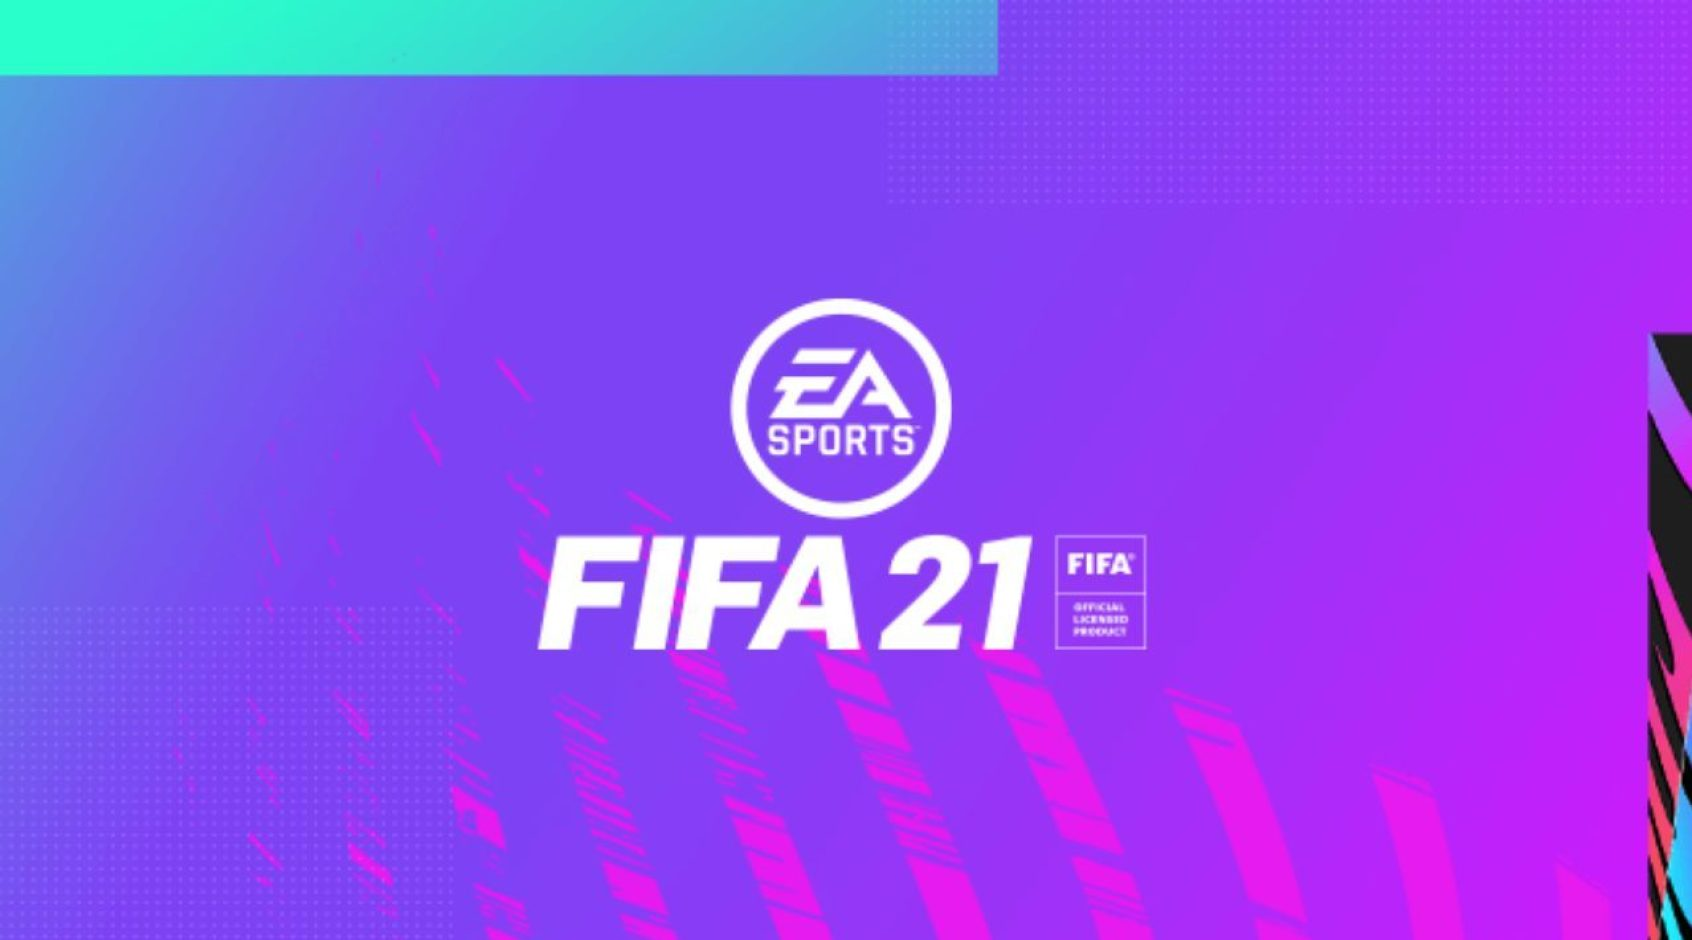 Без Месси: объявлена команда года FIFA 21